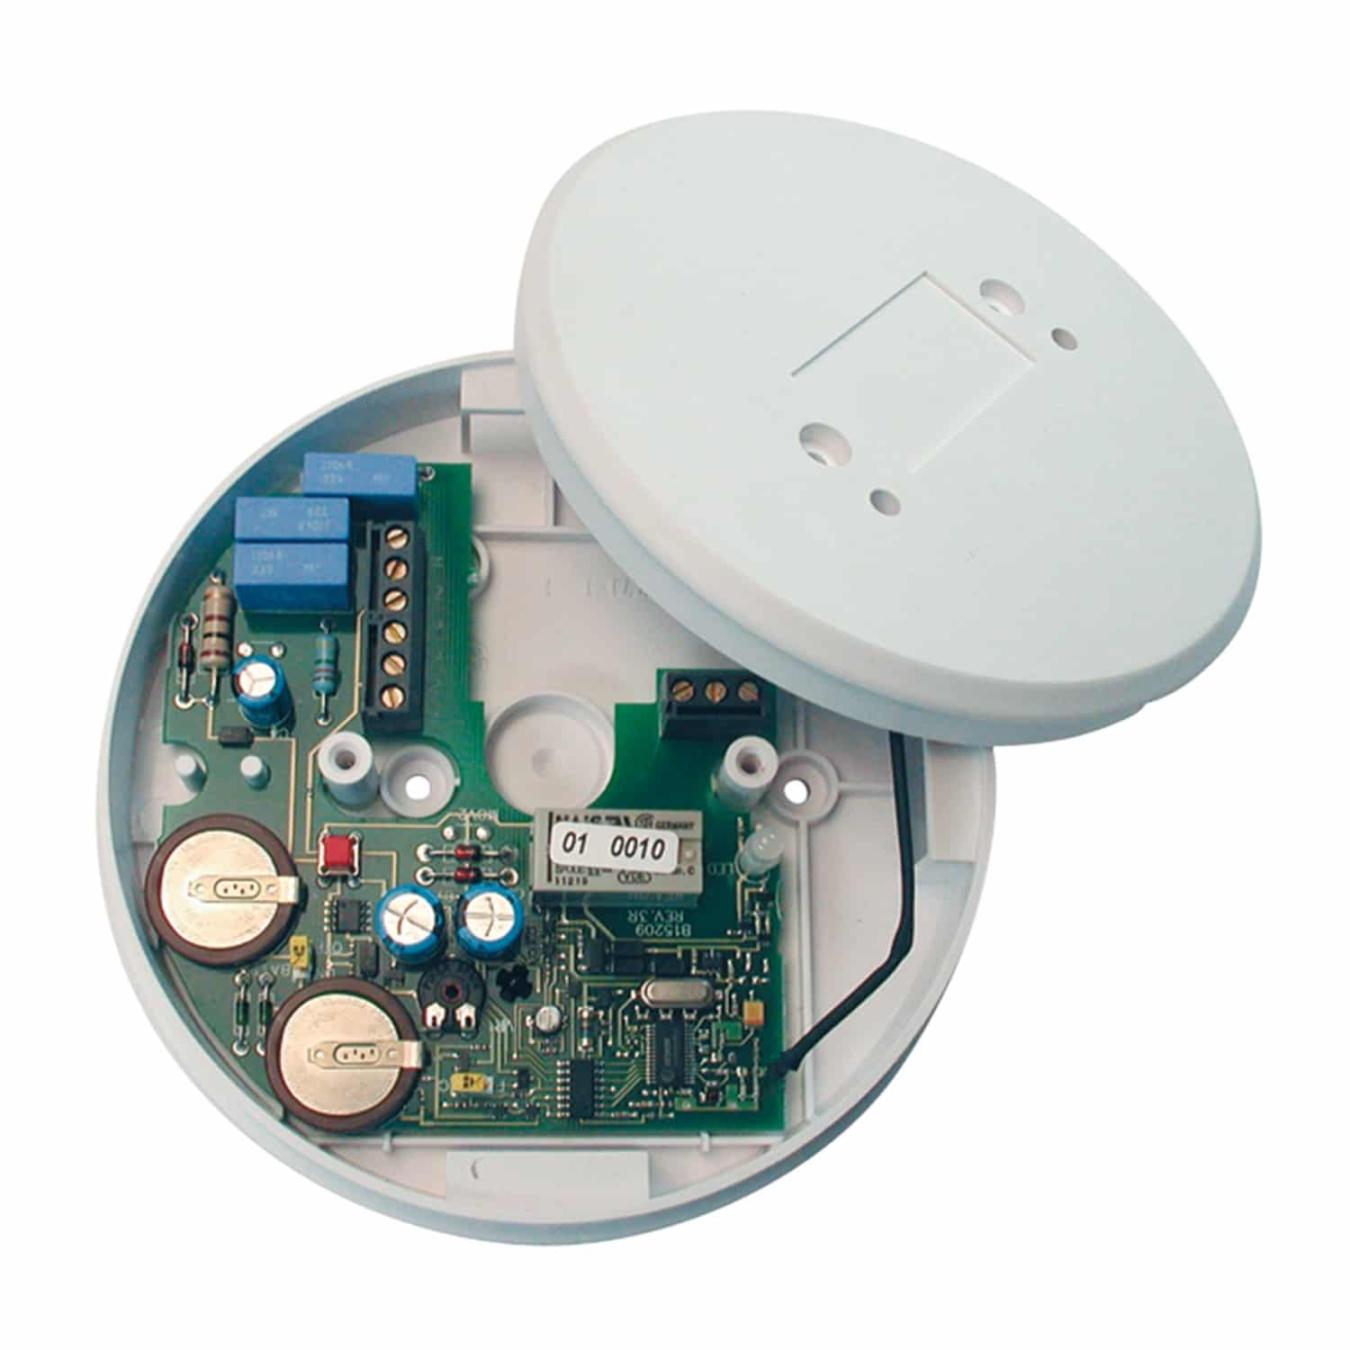 Koop EI 428RF Opbouwsokkel relais draadloos